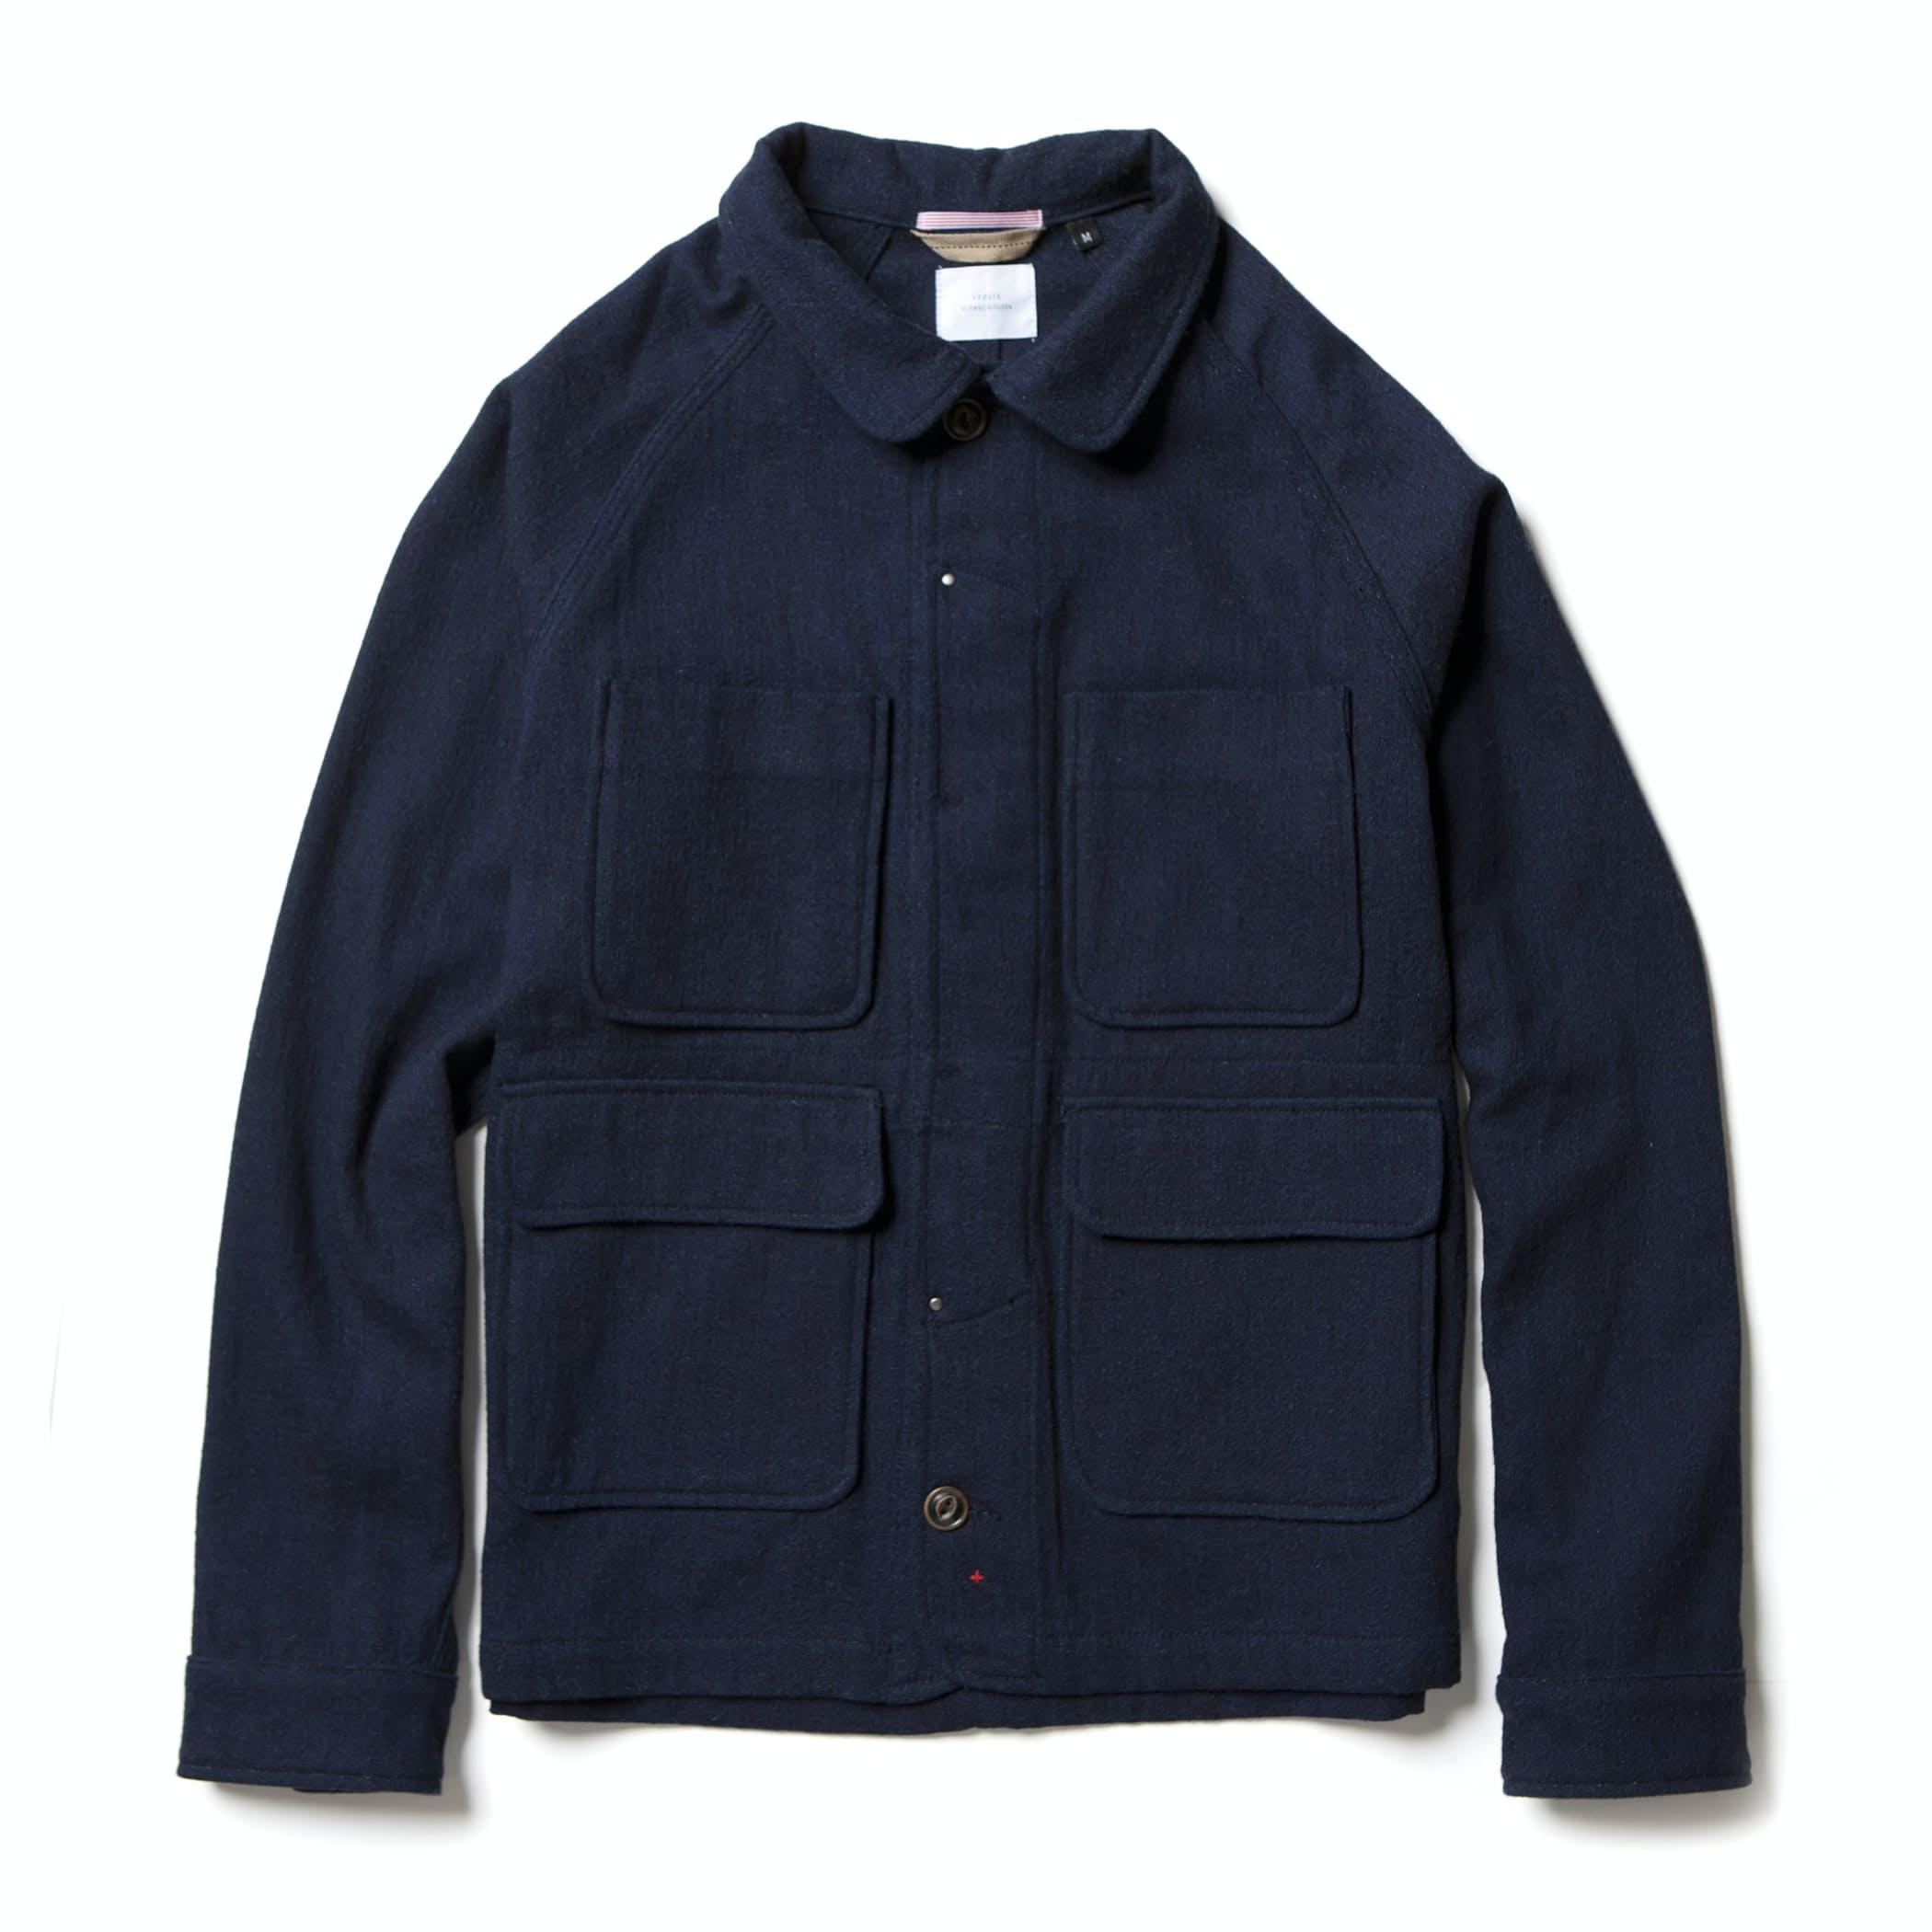 Rveuyogsyb apolis wool chore coat indigo 0 original